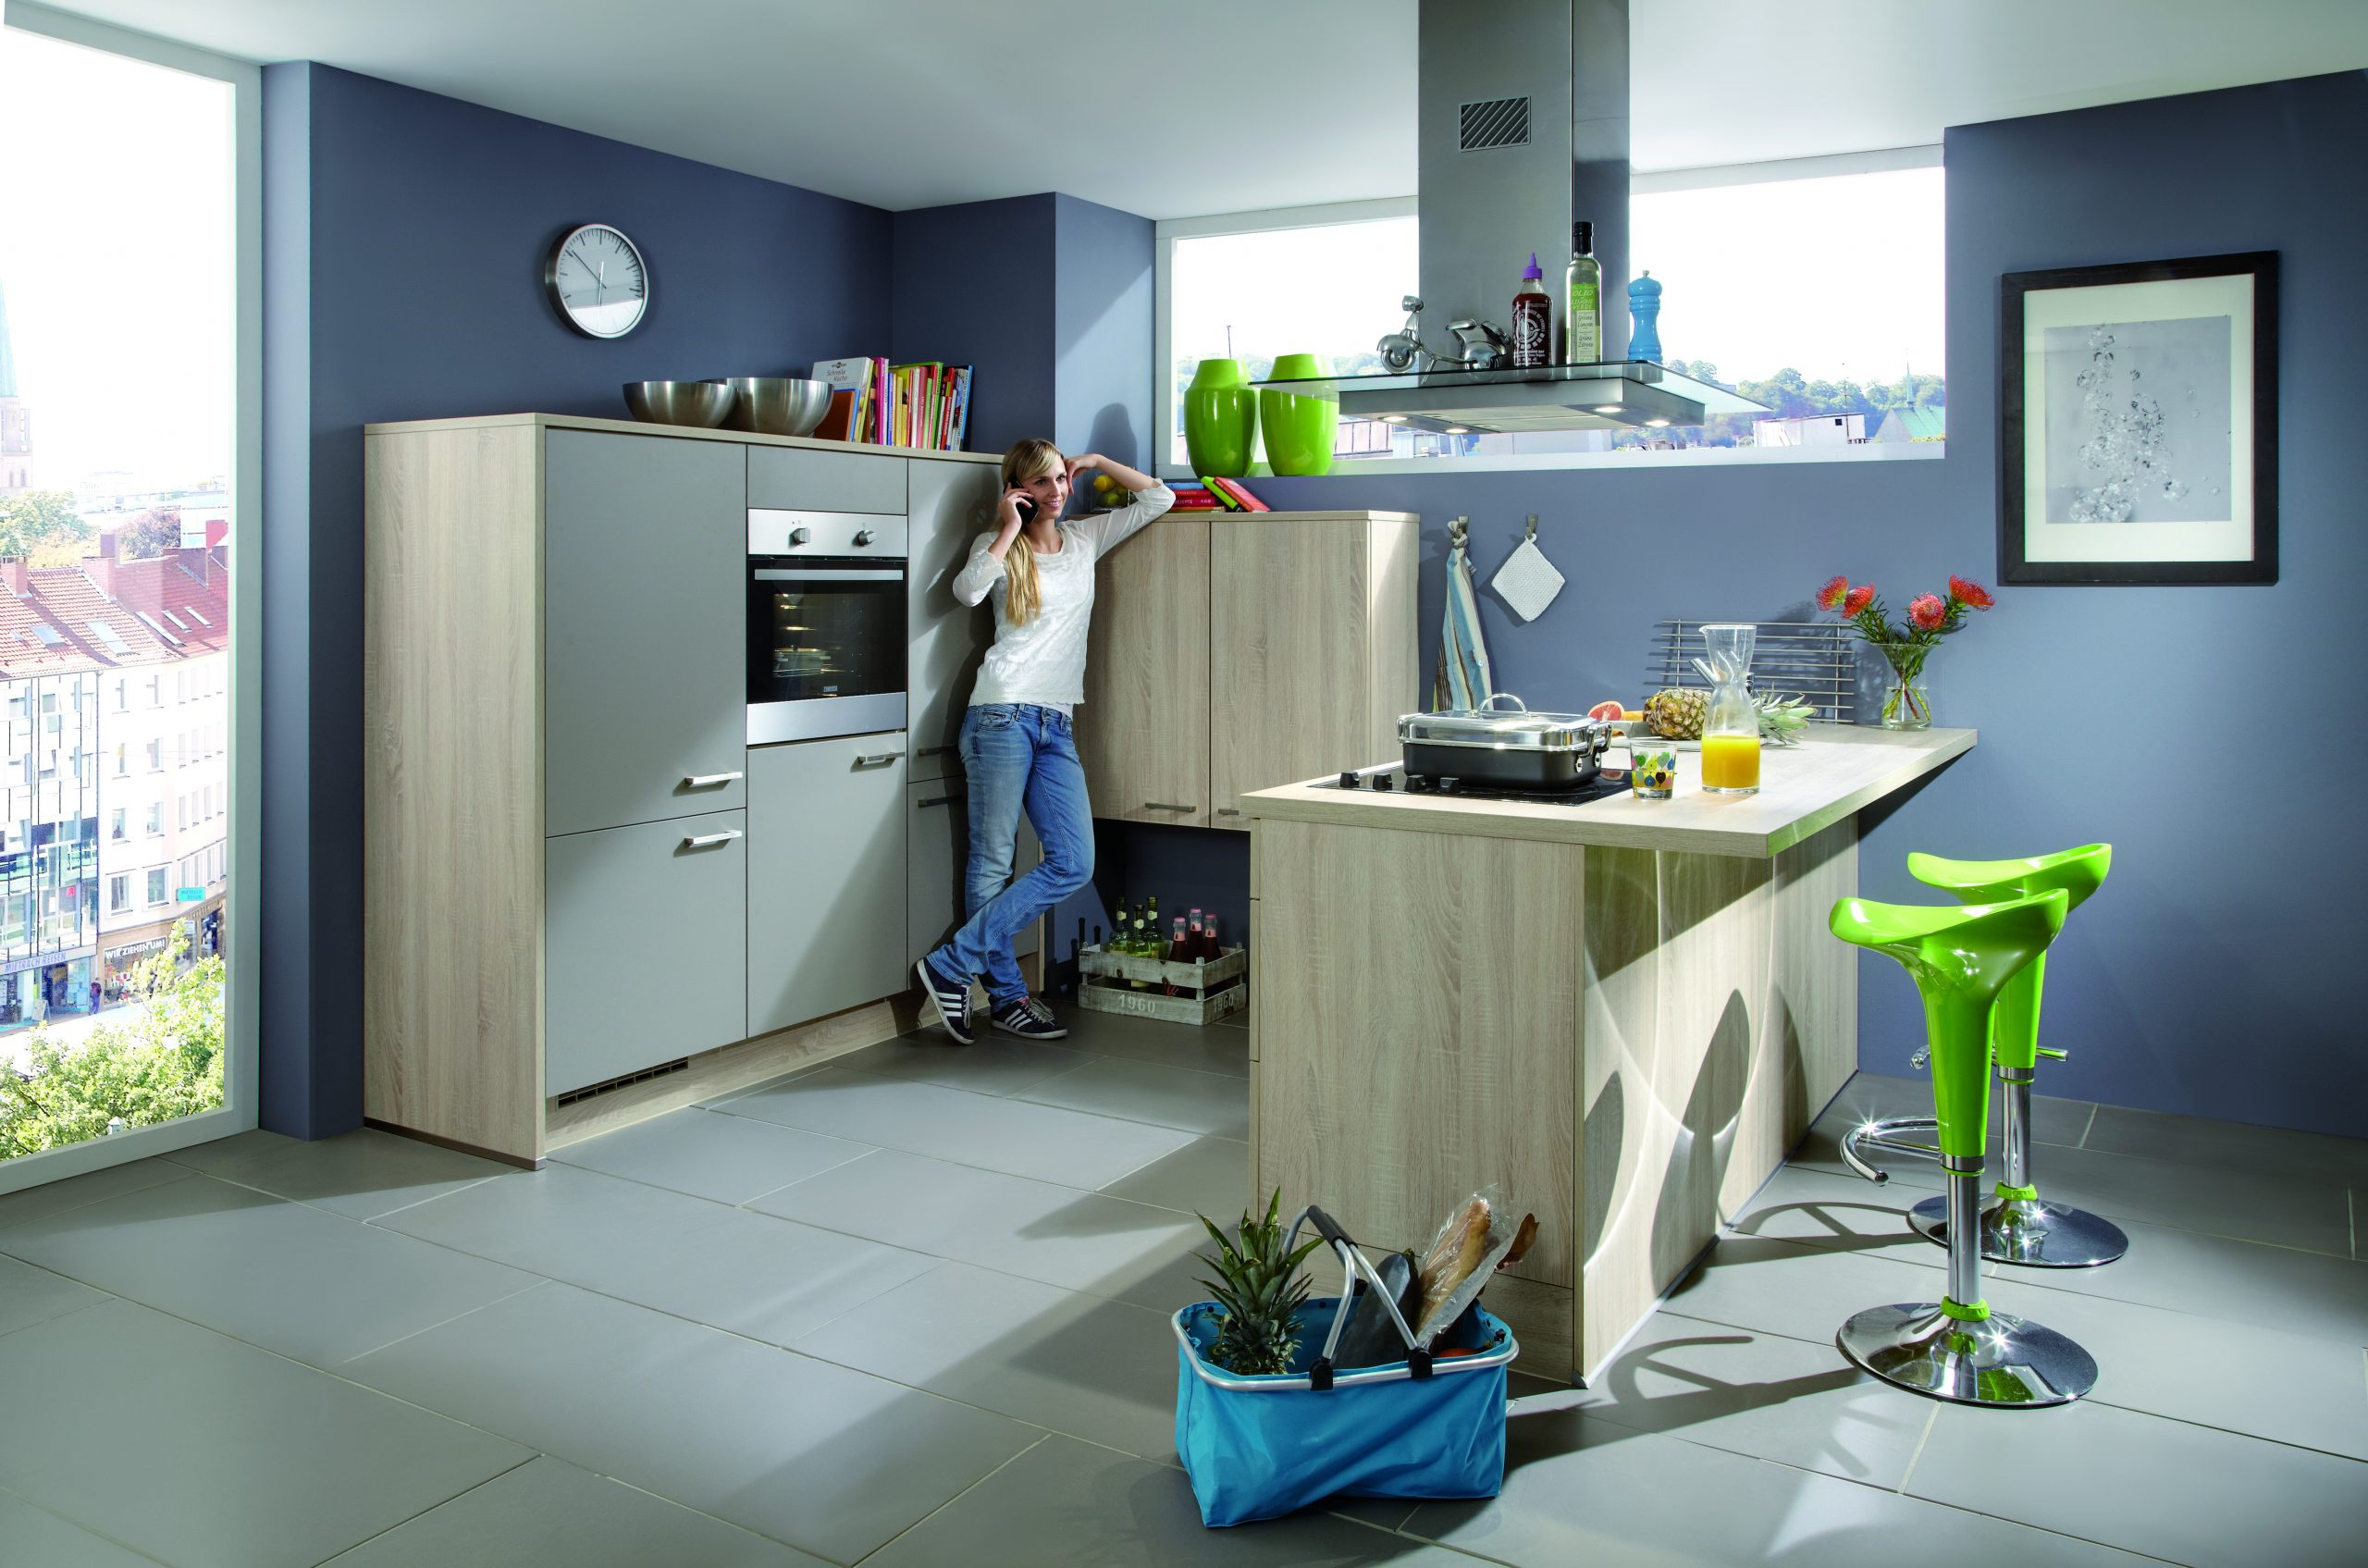 Full Size of Küche Mit Elektrogeräten Billig Kaufen Küche Mit Elektrogeräten Otto Küche Mit Elektrogeräten Gebraucht Kaufen Küche Mit Elektrogeräten Preis Küche Eckküche Mit Elektrogeräten